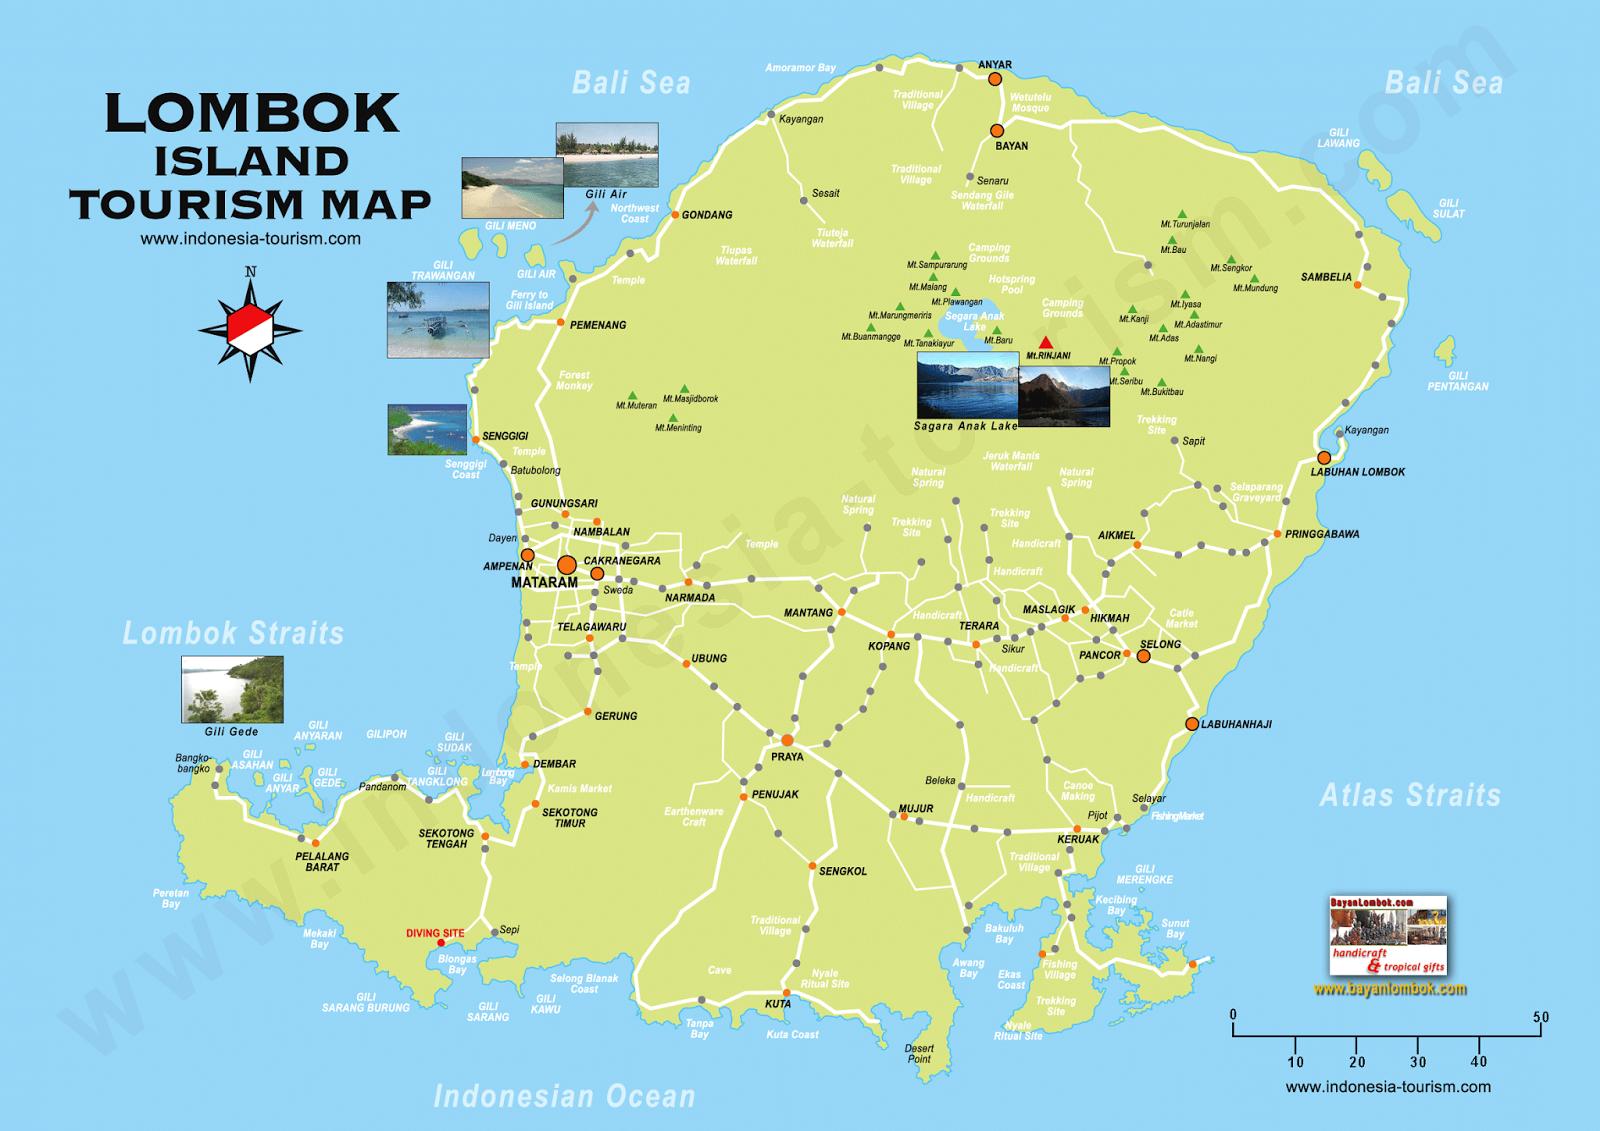 Peta Wisata Lombok Gambaran Umum Tempat Pulau Pura Gunung Pengsong